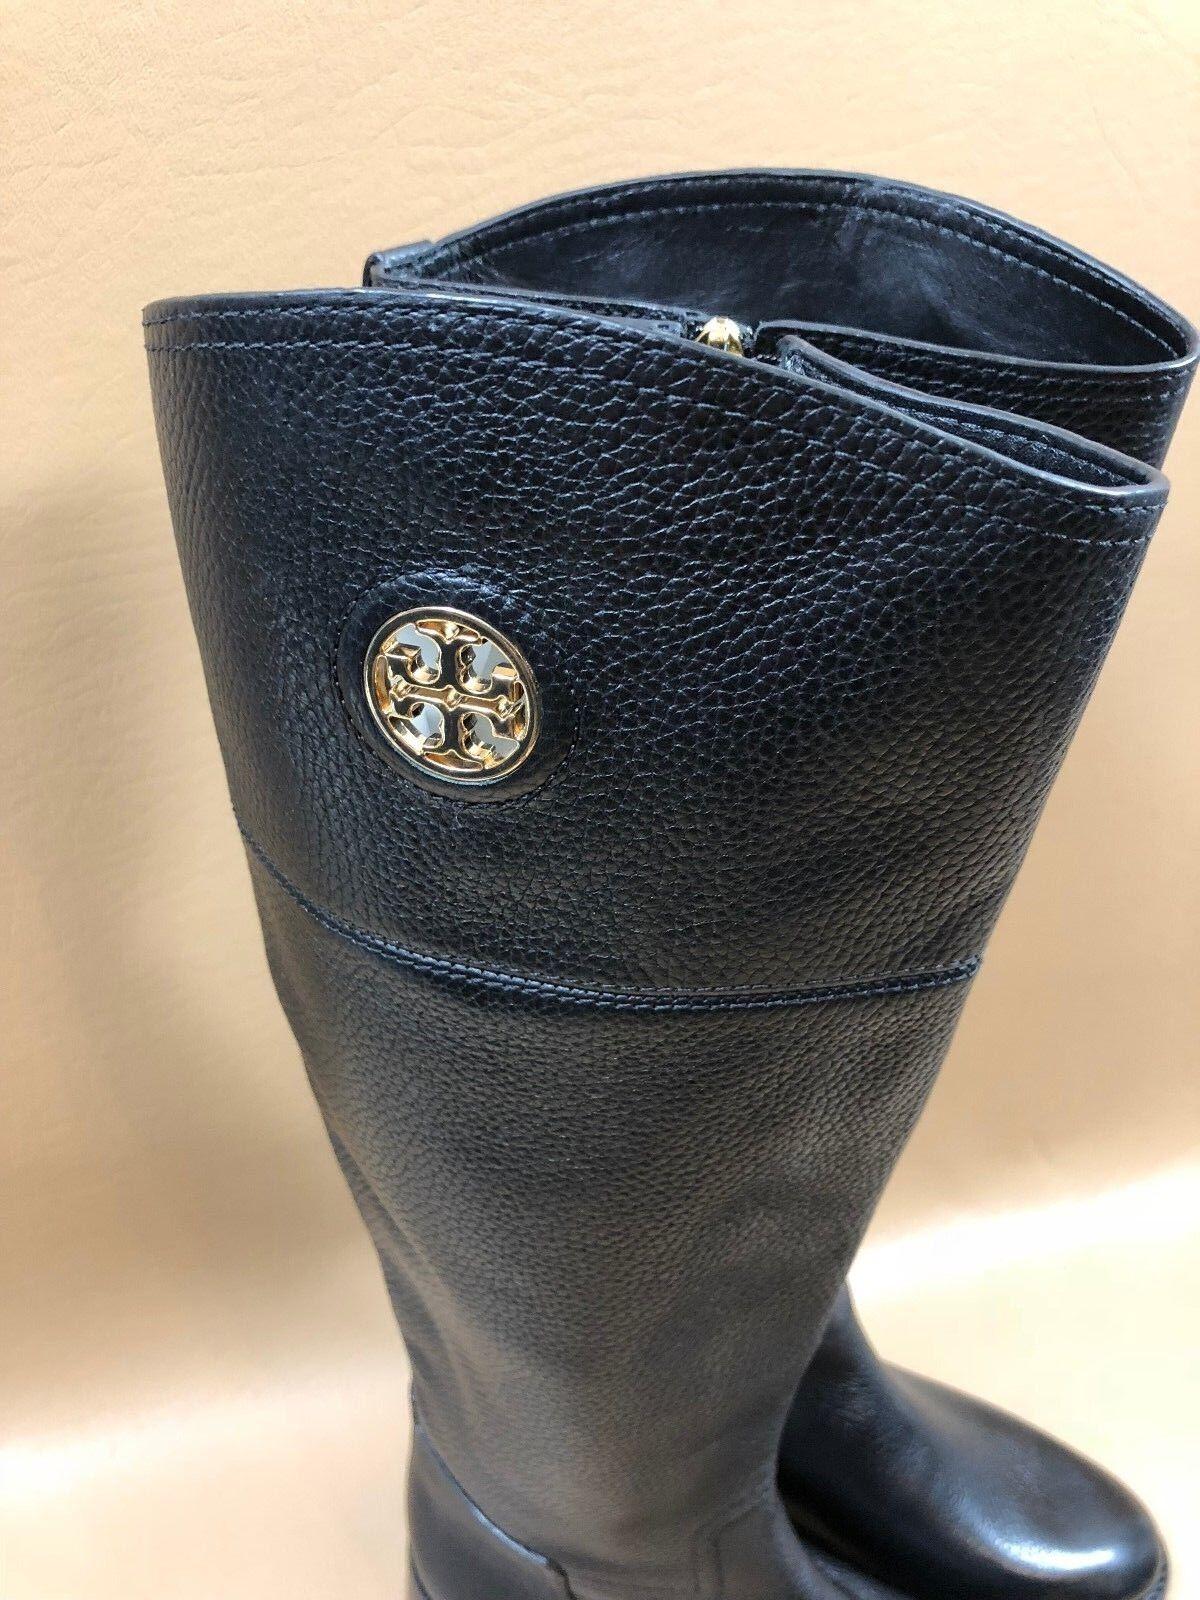 88 Tory Tory Tory Burch Black Logo Plate Riding Boots Size 5.5 M 180bb4